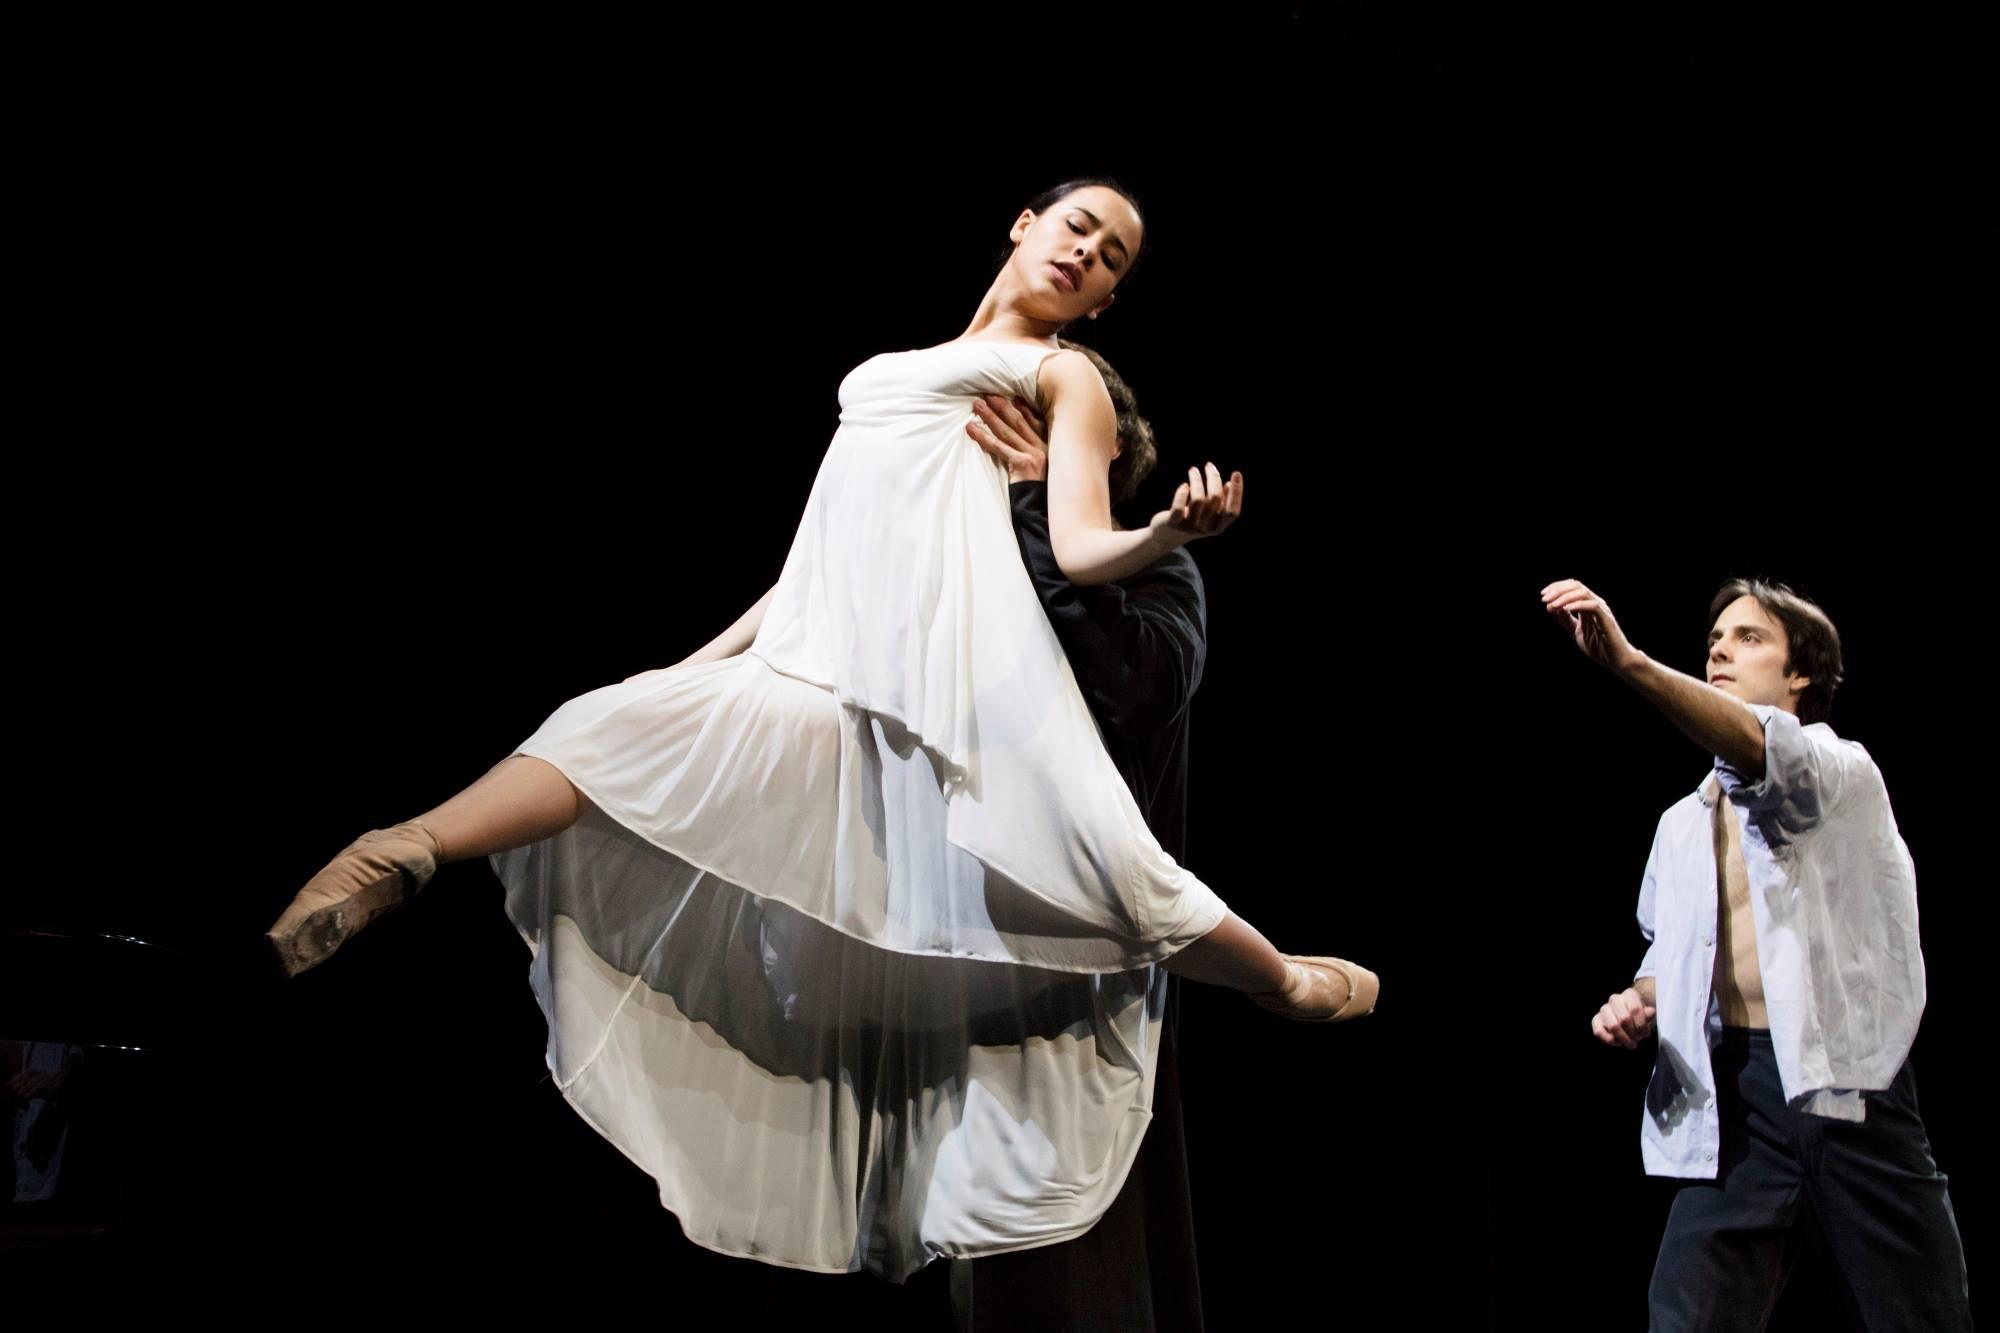 Pas de trois; Winnie Dias, Nicolas Glässman and Florian Pohl performing De-Voir. Photo by Kiran West.